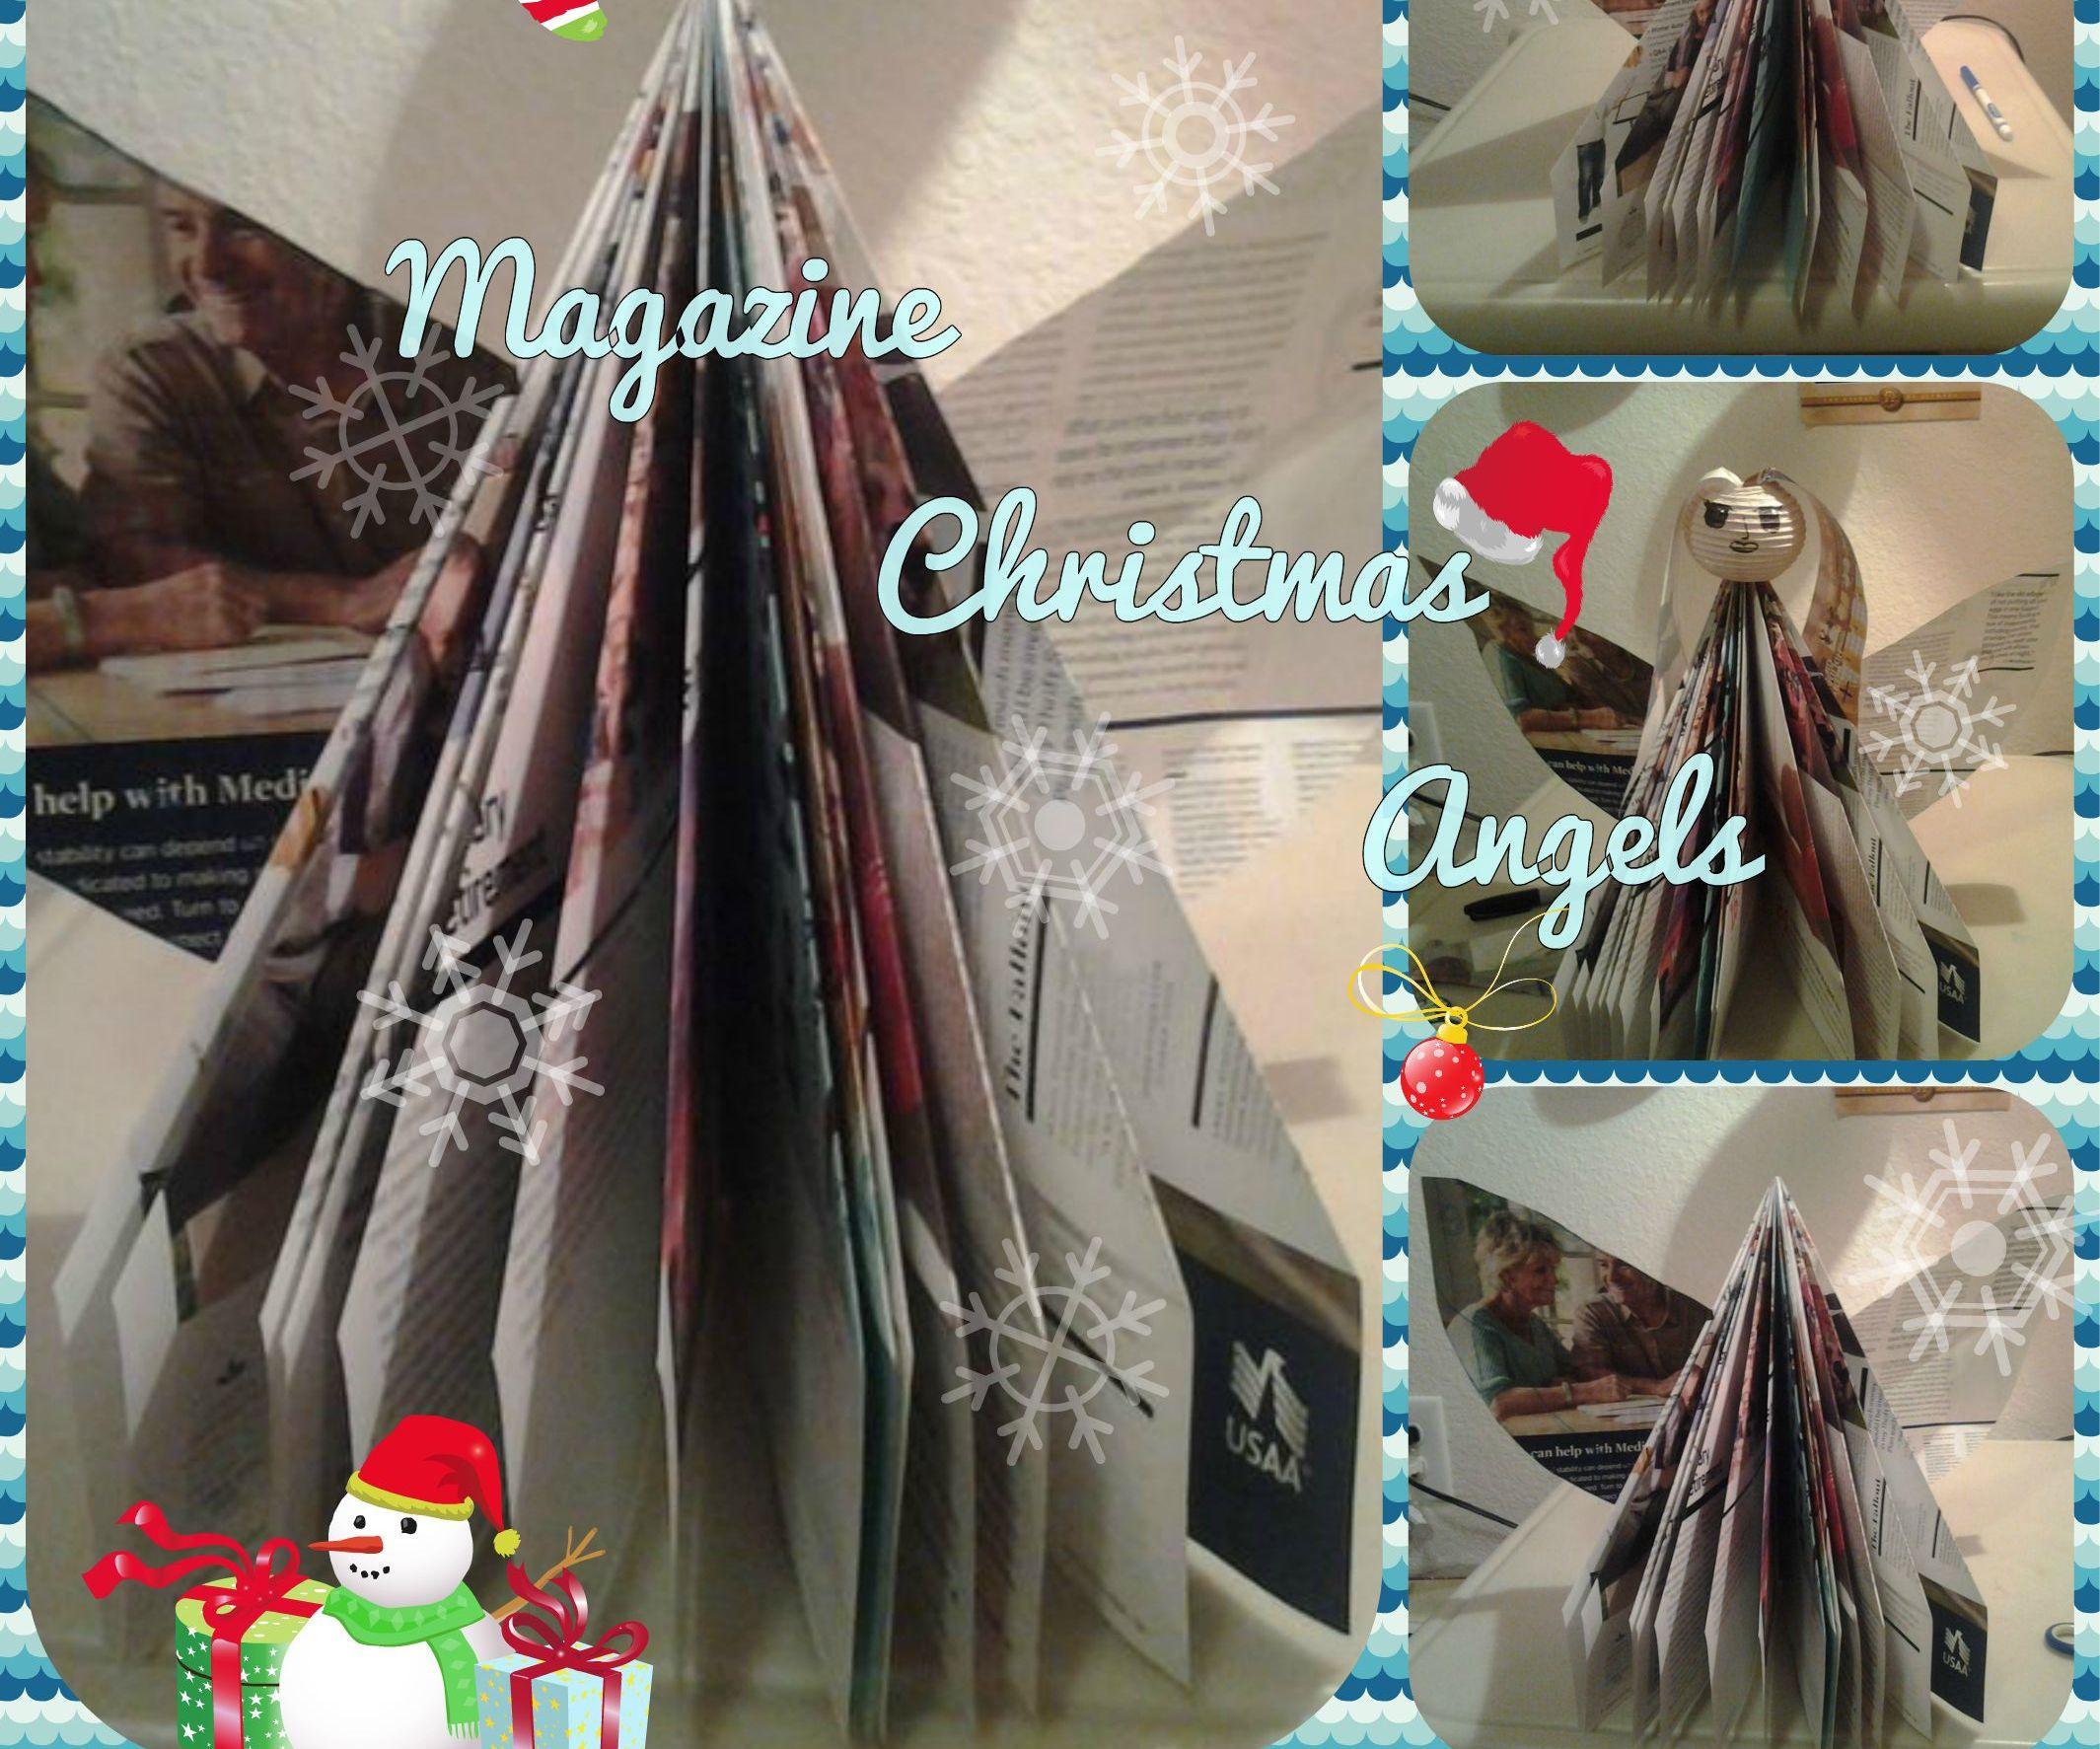 Magazine Christmas Angel